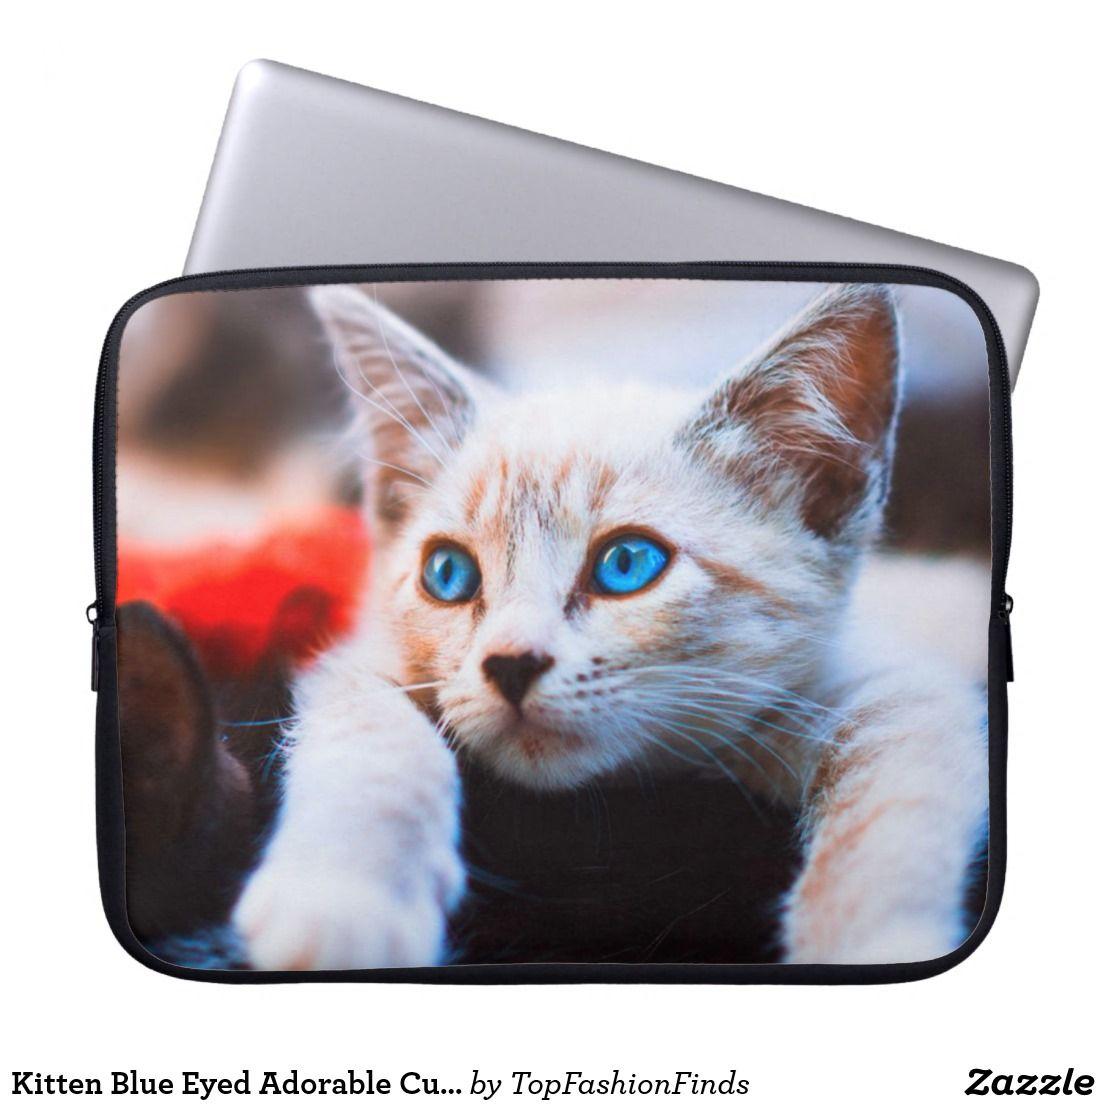 Kitten blue eyed adorable cute cat laptop sleeve zazzle